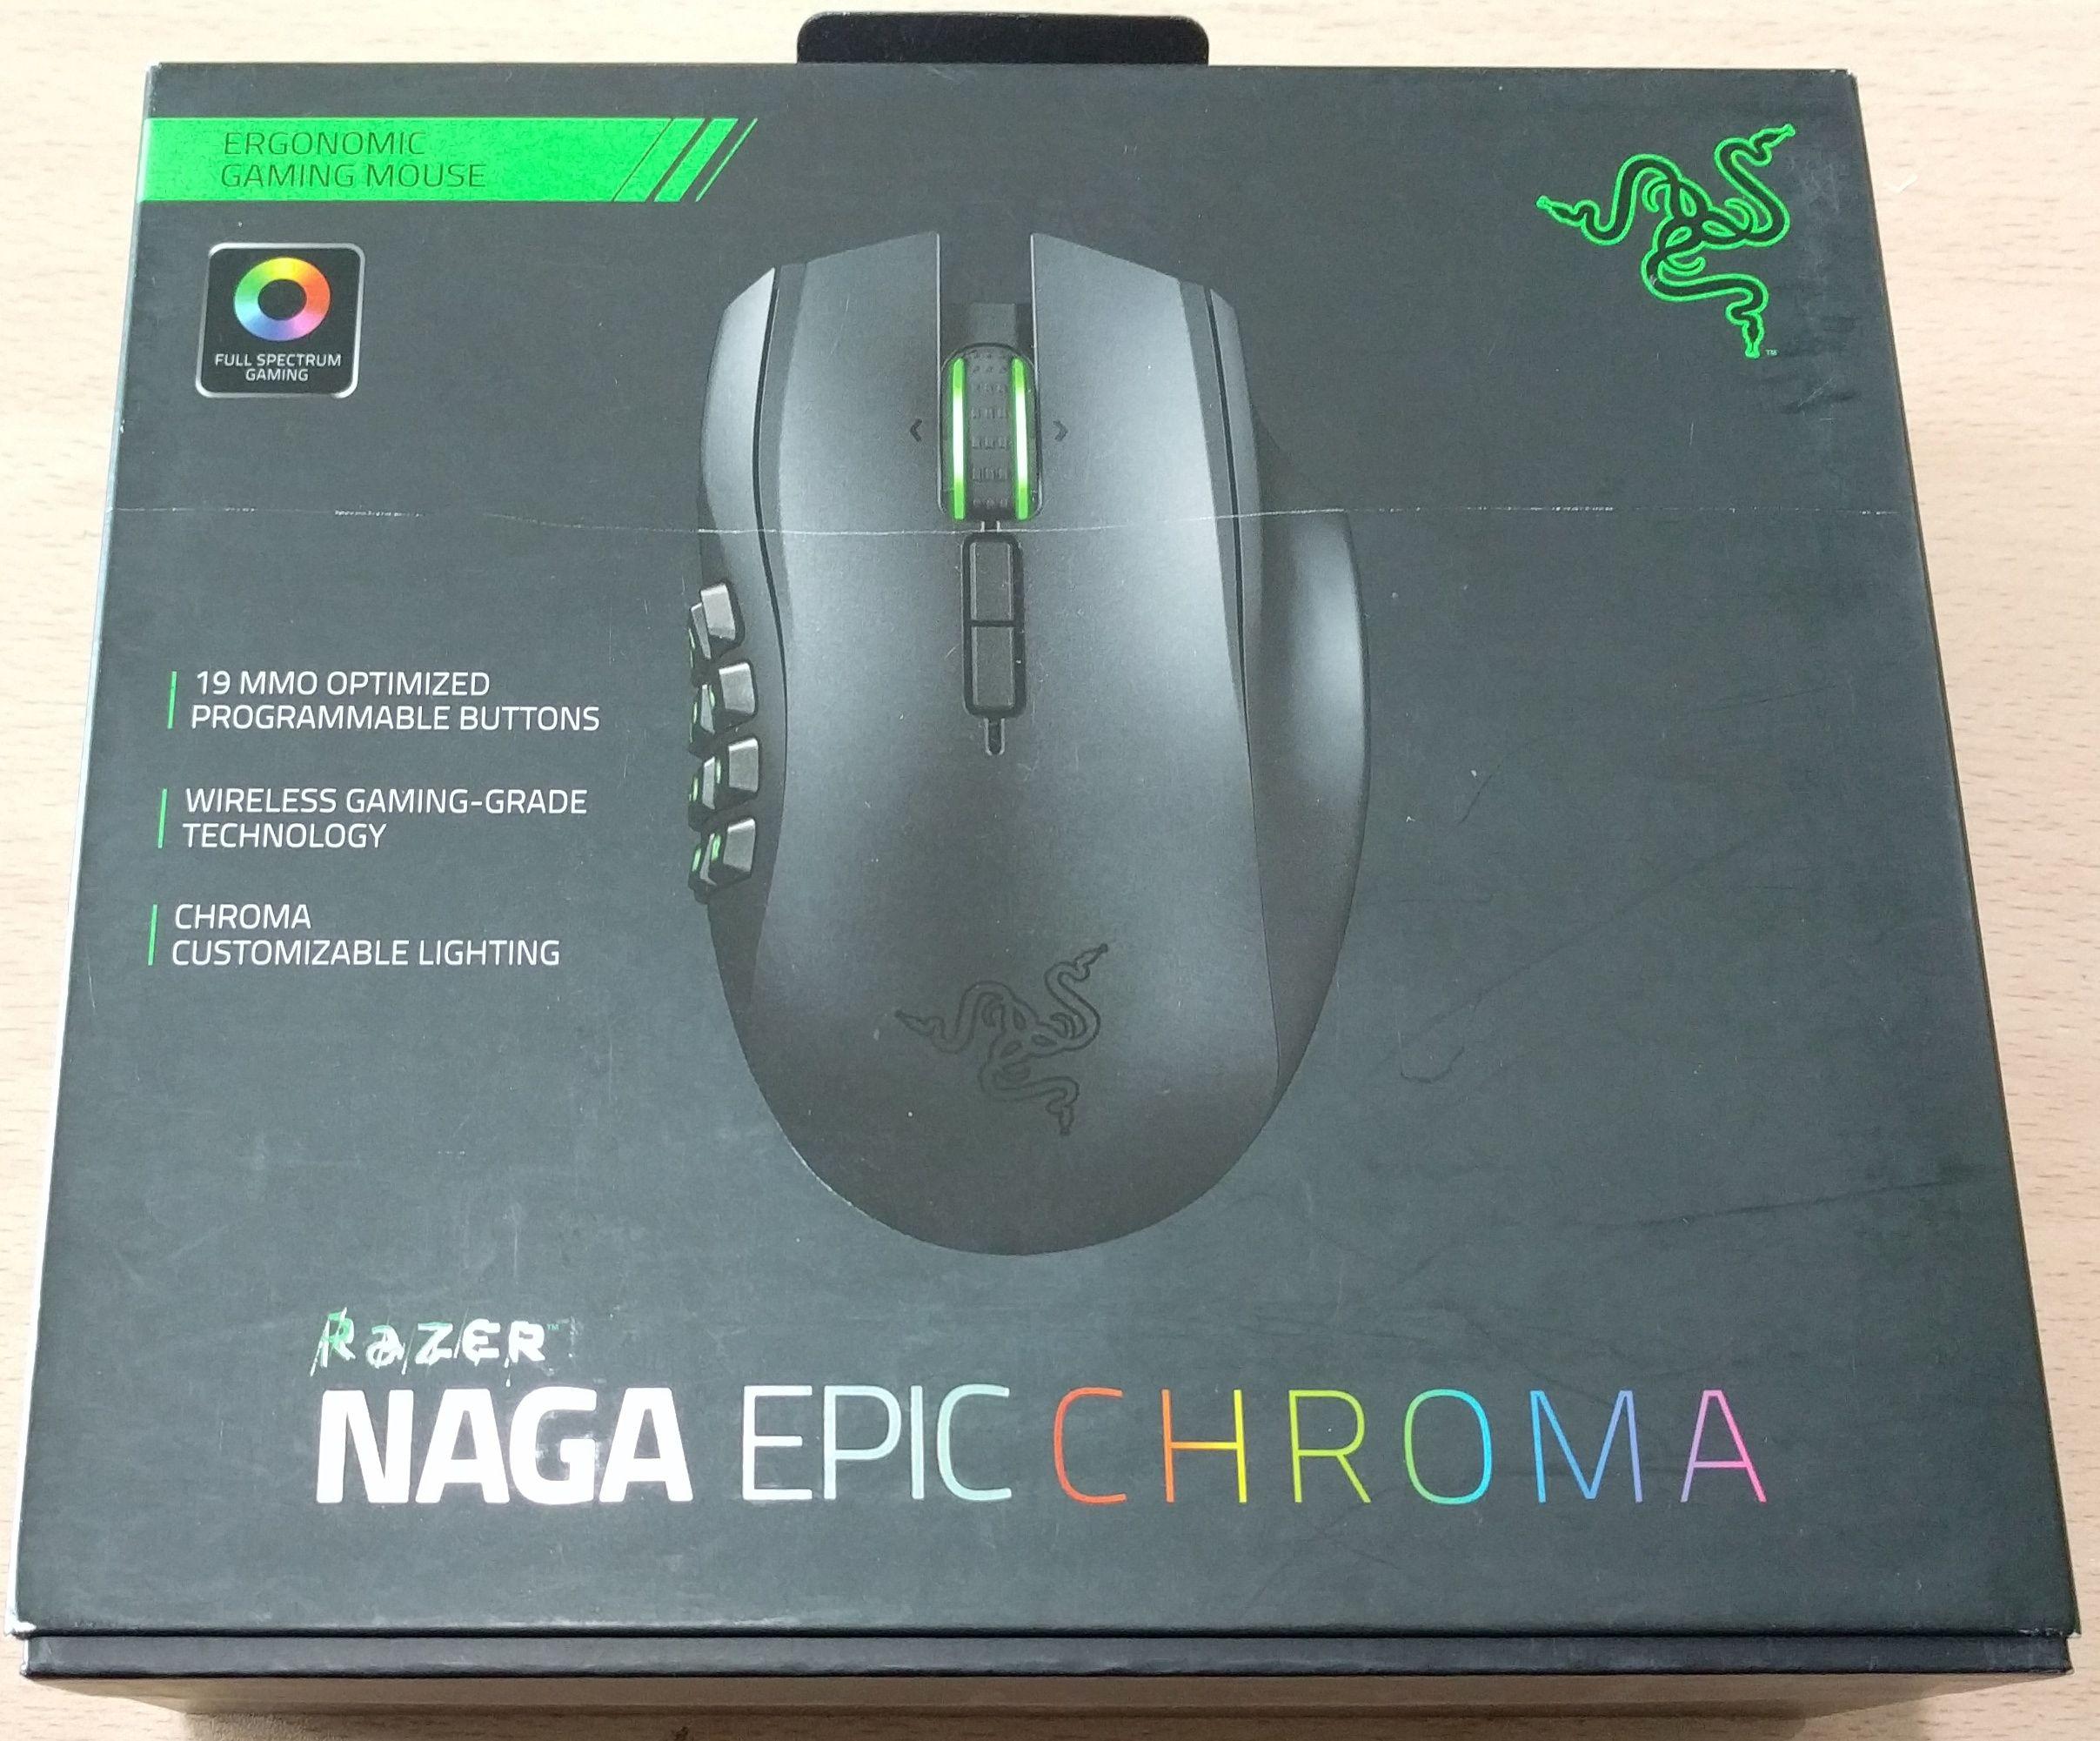 Razer Naga Epic Chroma Ratn Gaming Review Pgina 2 De 5 Islabit Wired Wireless Mmo 1